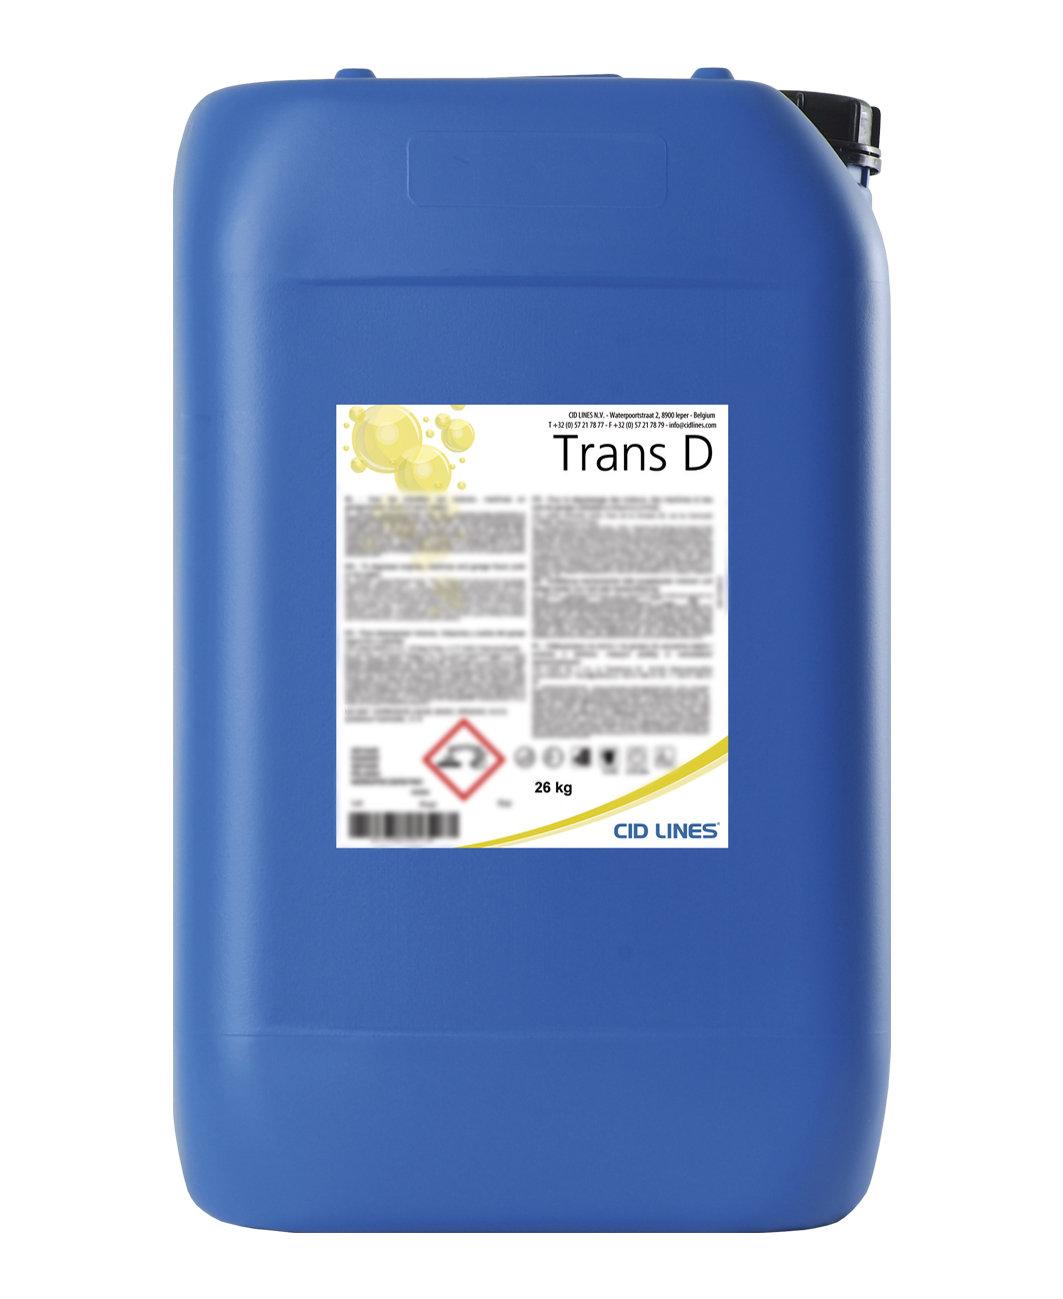 Kenotek Trans-D, inhoud: 26 kg